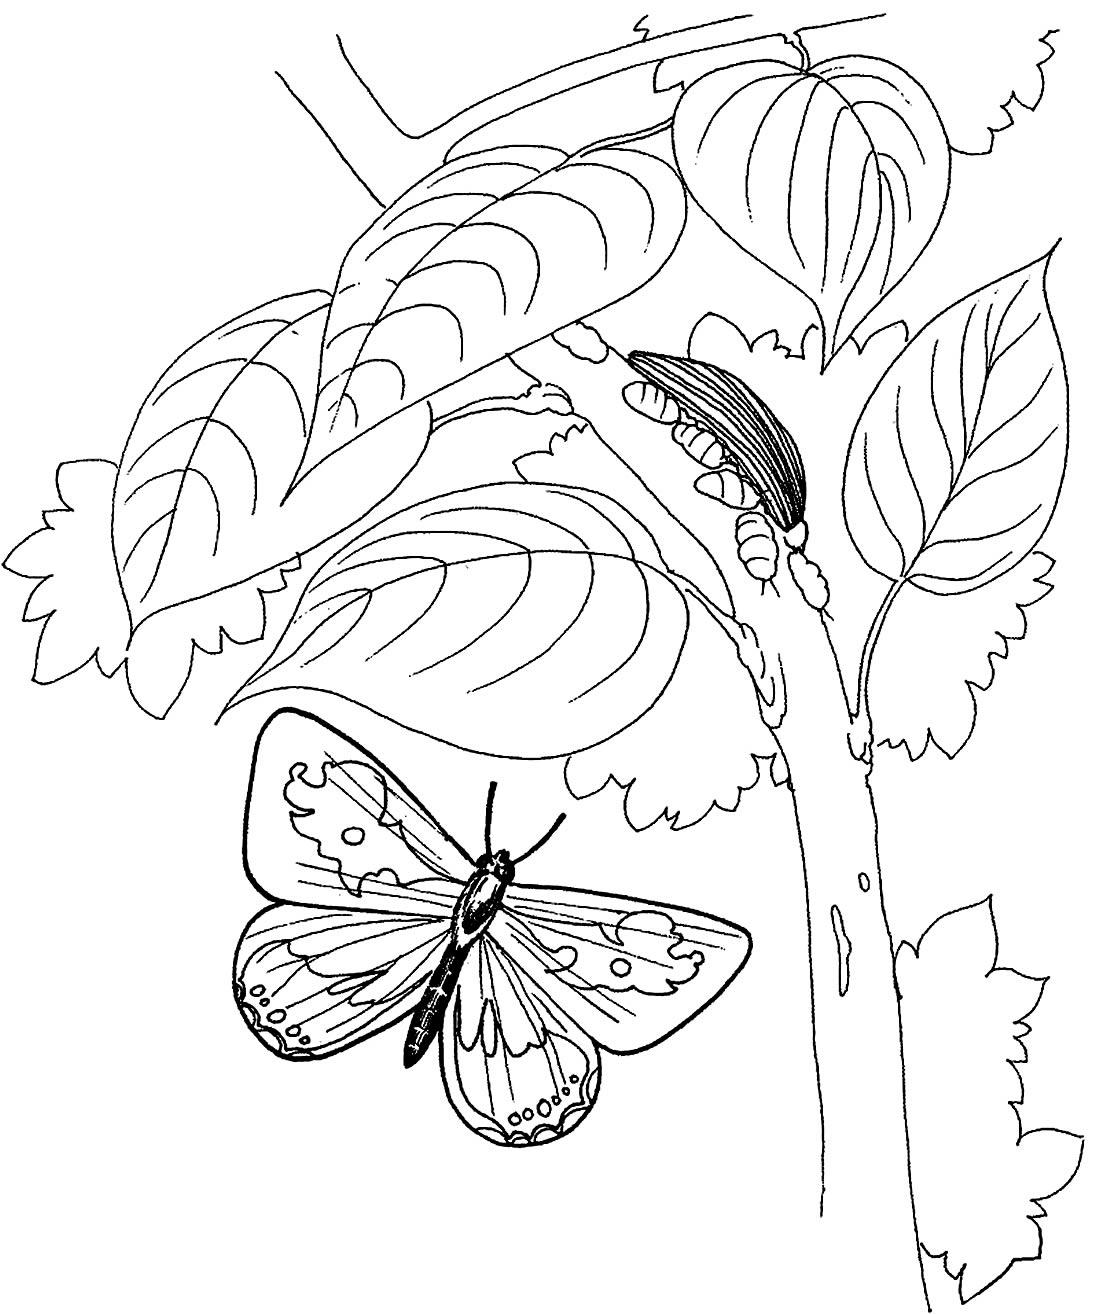 Desenho de Lagarta para colorir